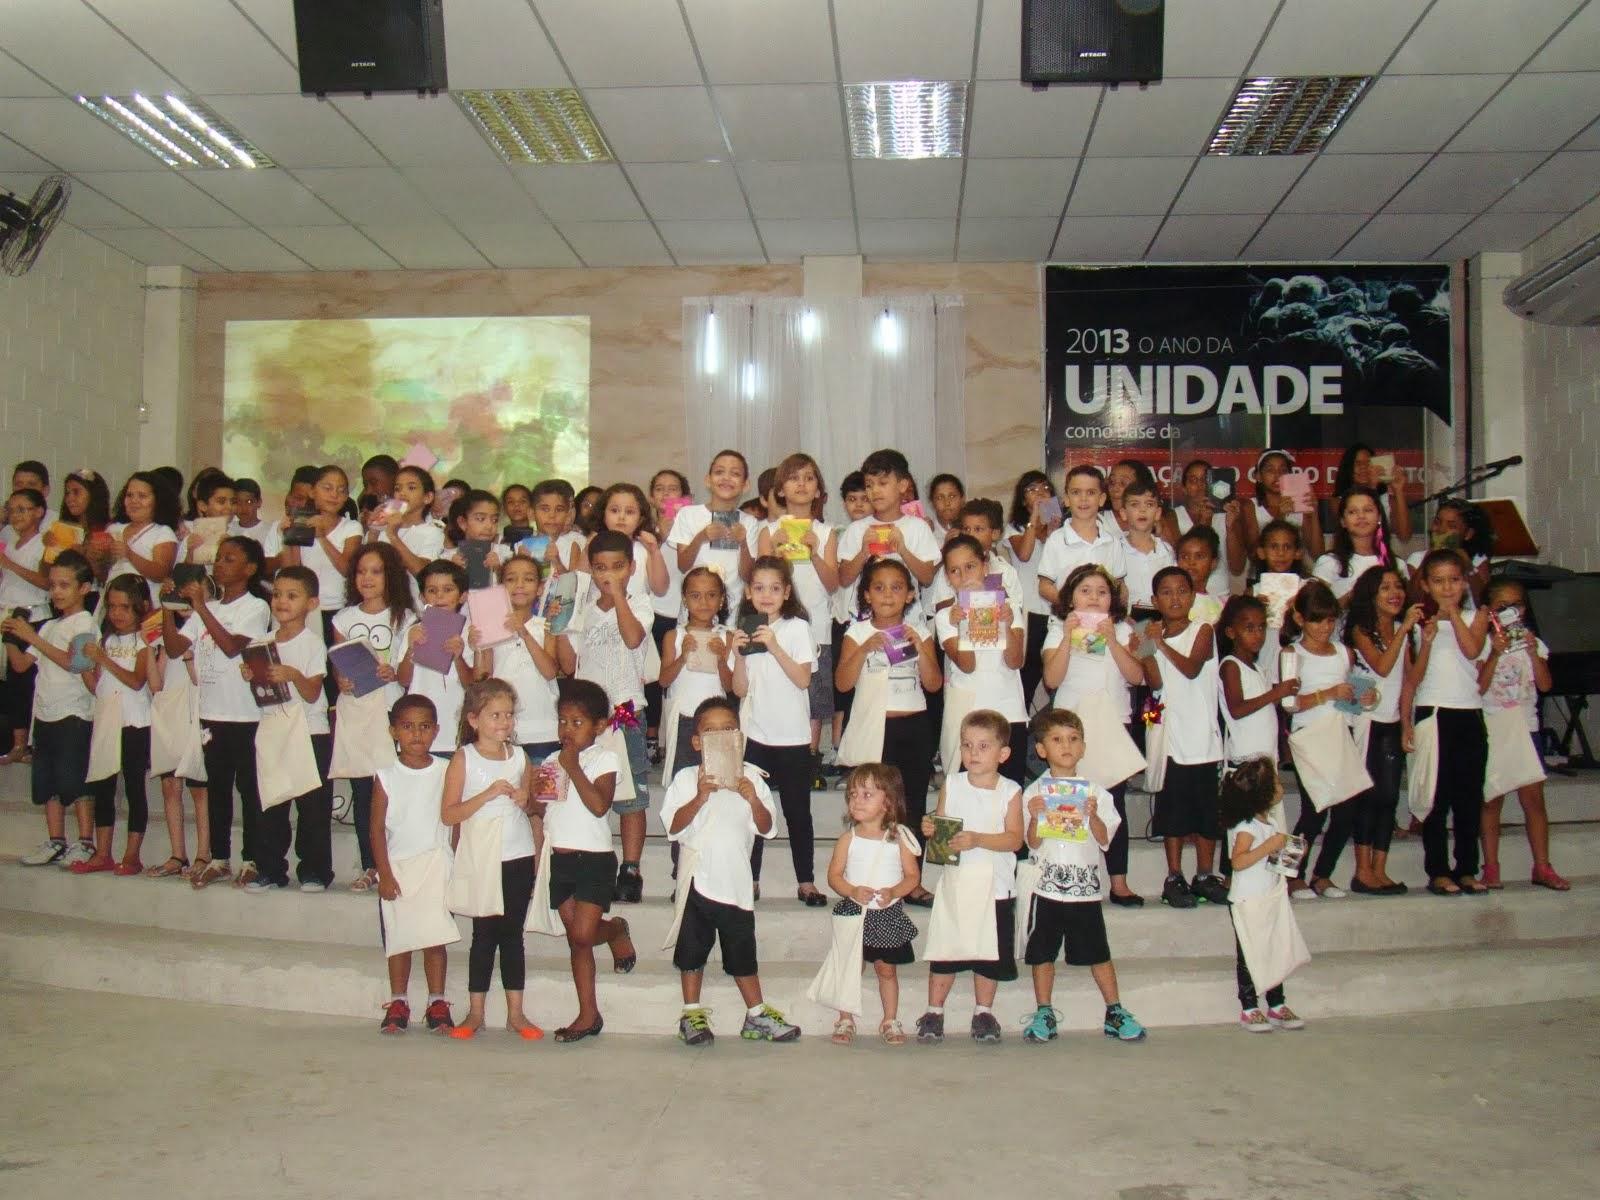 Maanaim Radicais Kids e Juvenis